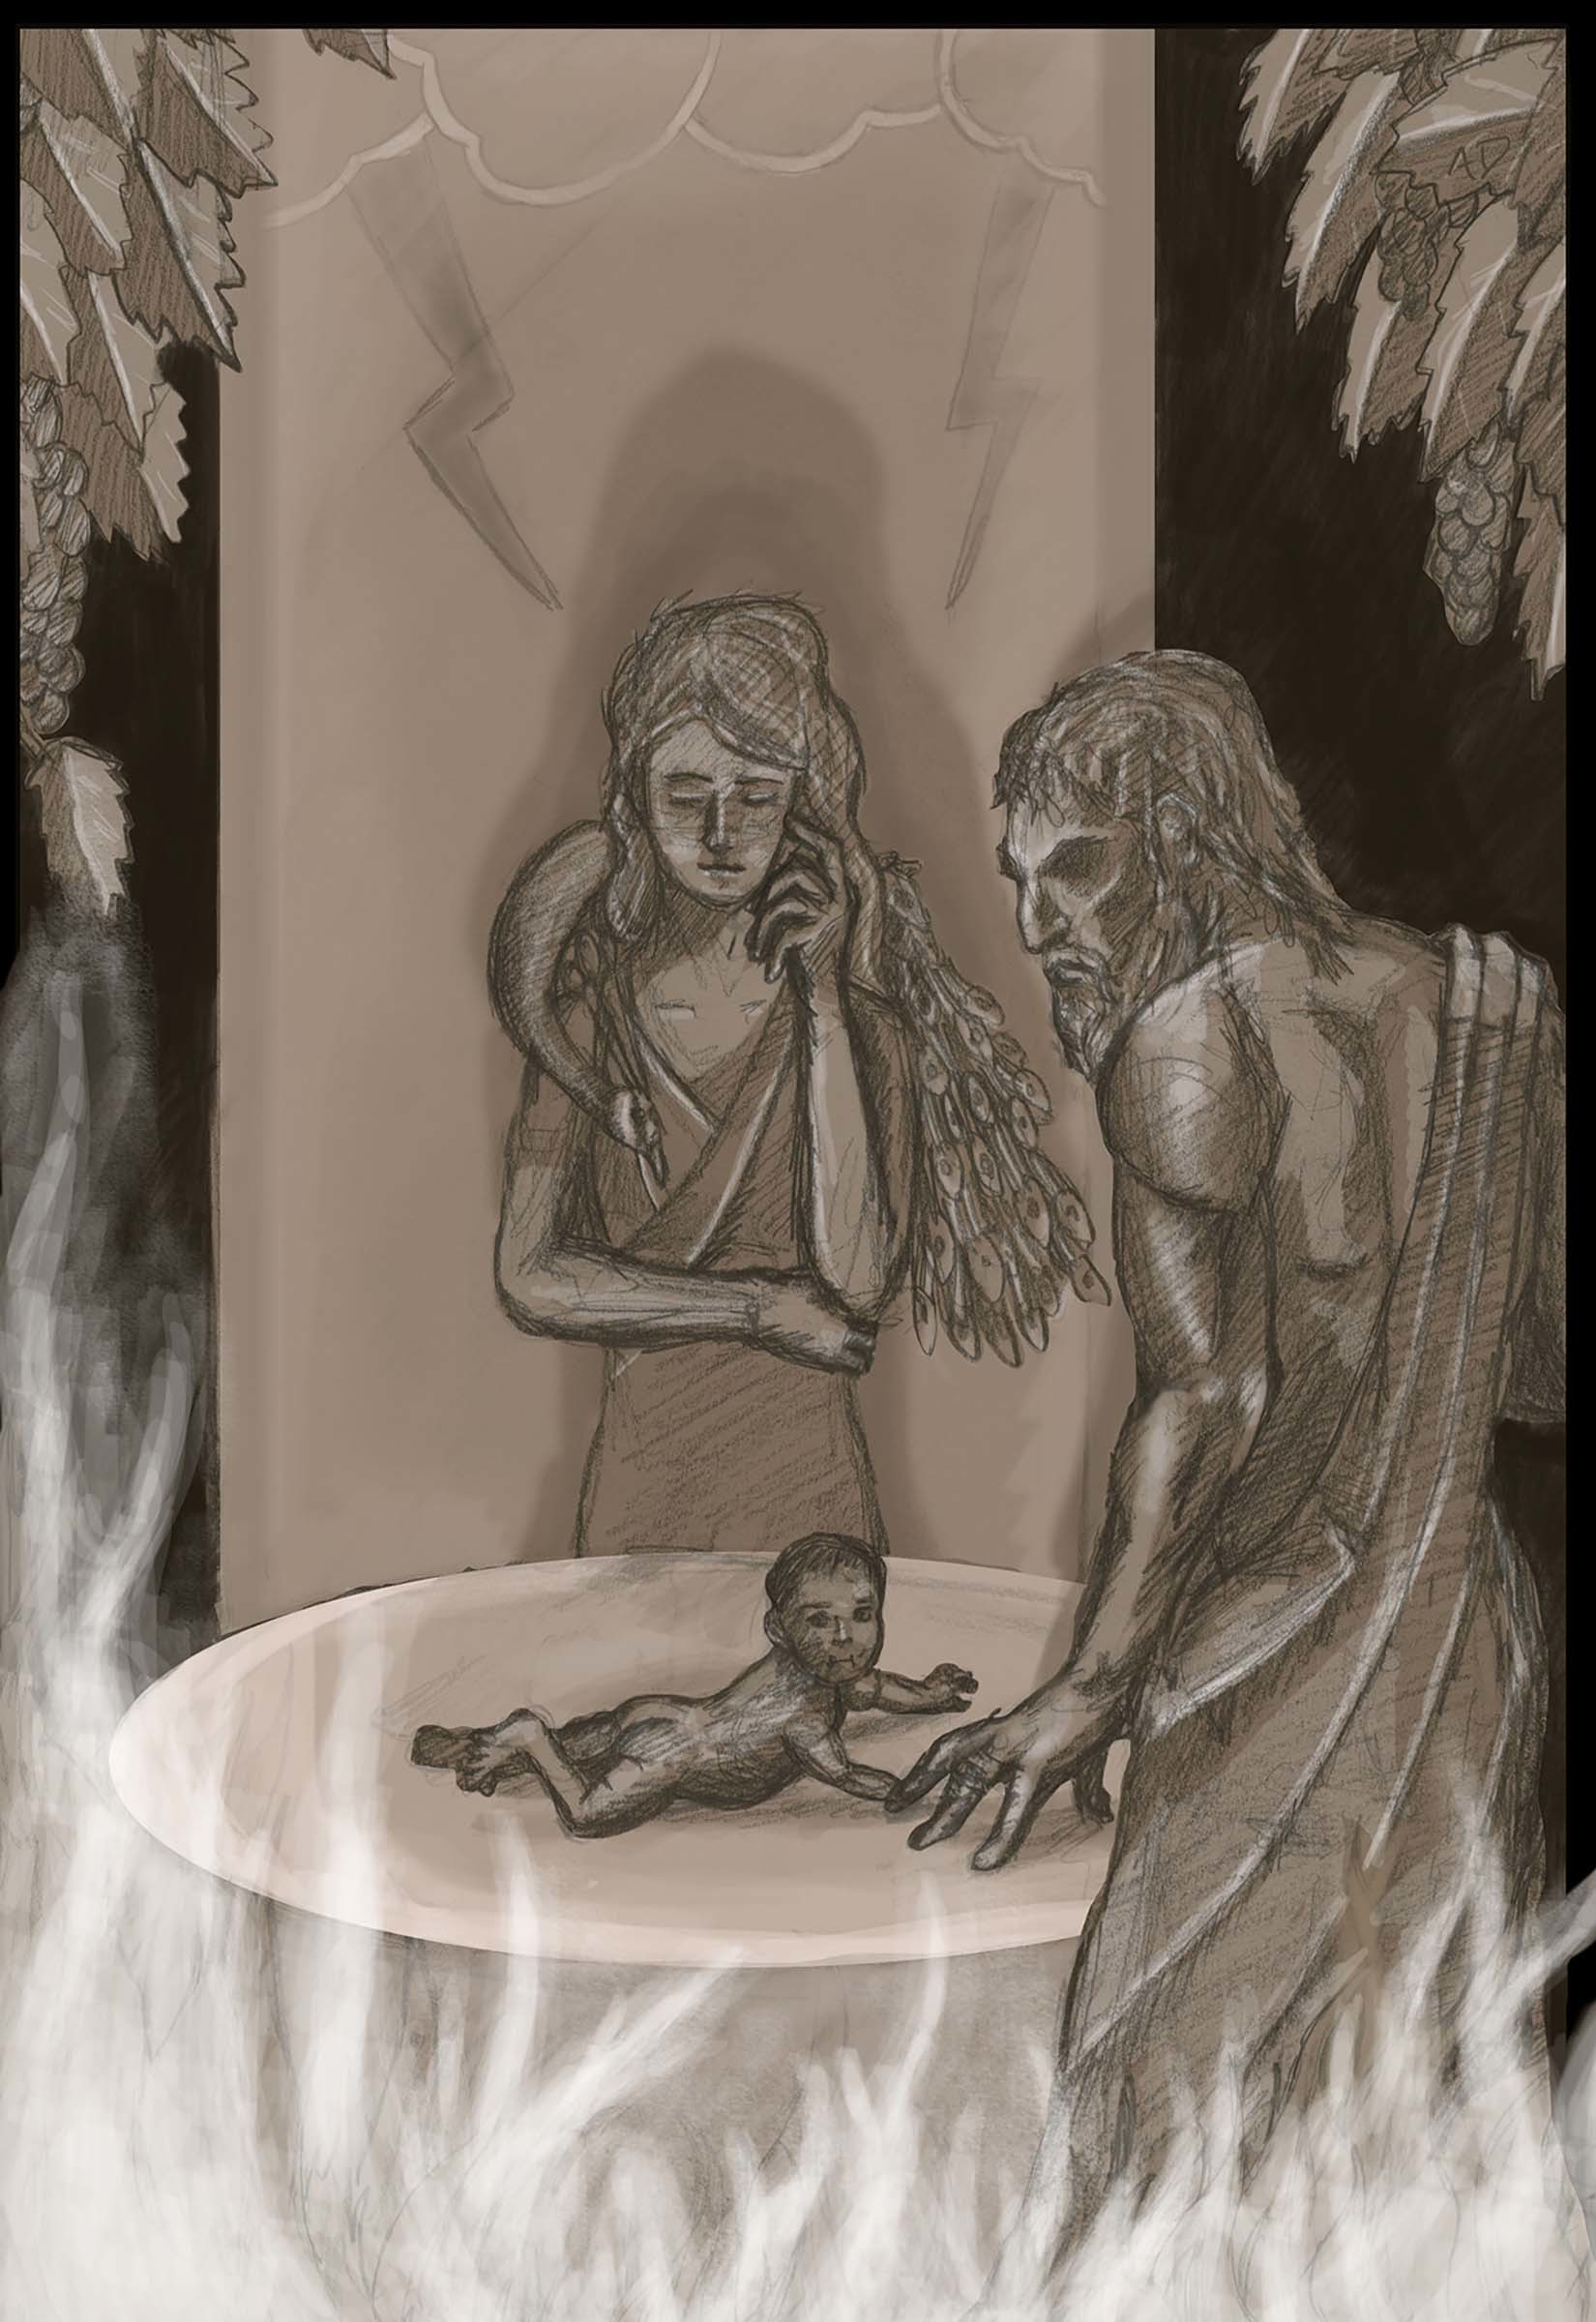 Semele student artwork from MassArt, Dempsey